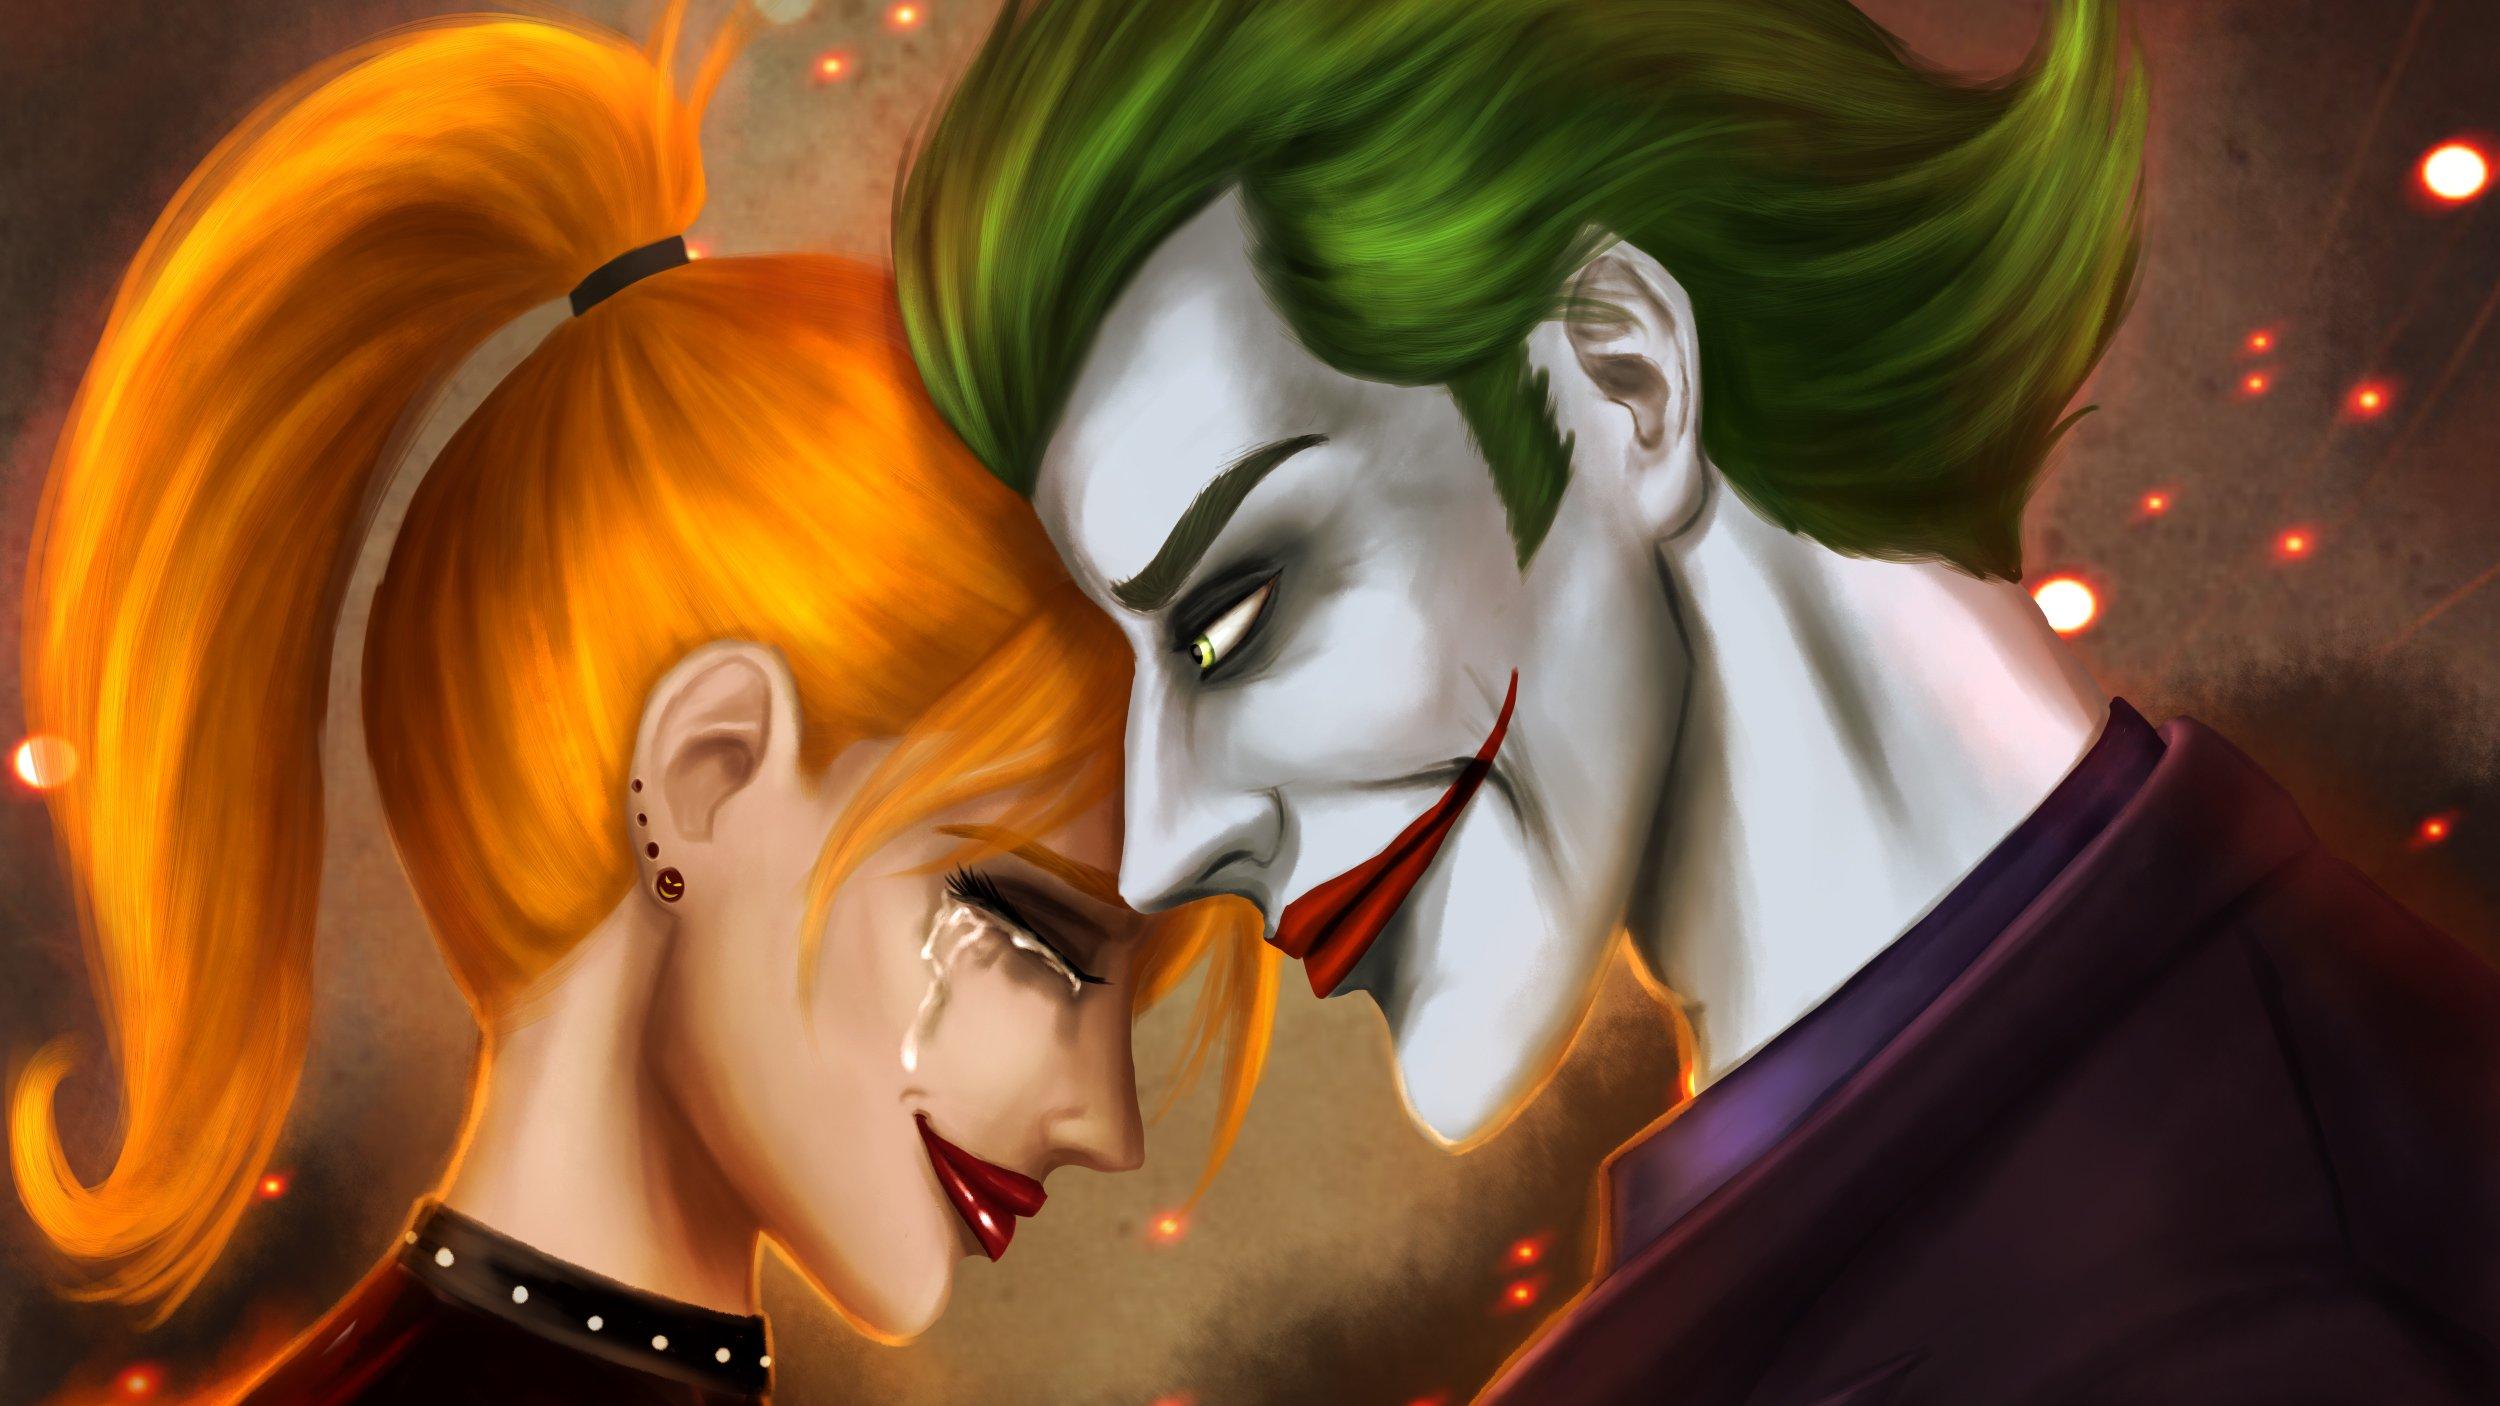 Fondos de pantalla El guasón y Harley Quinn Fanart